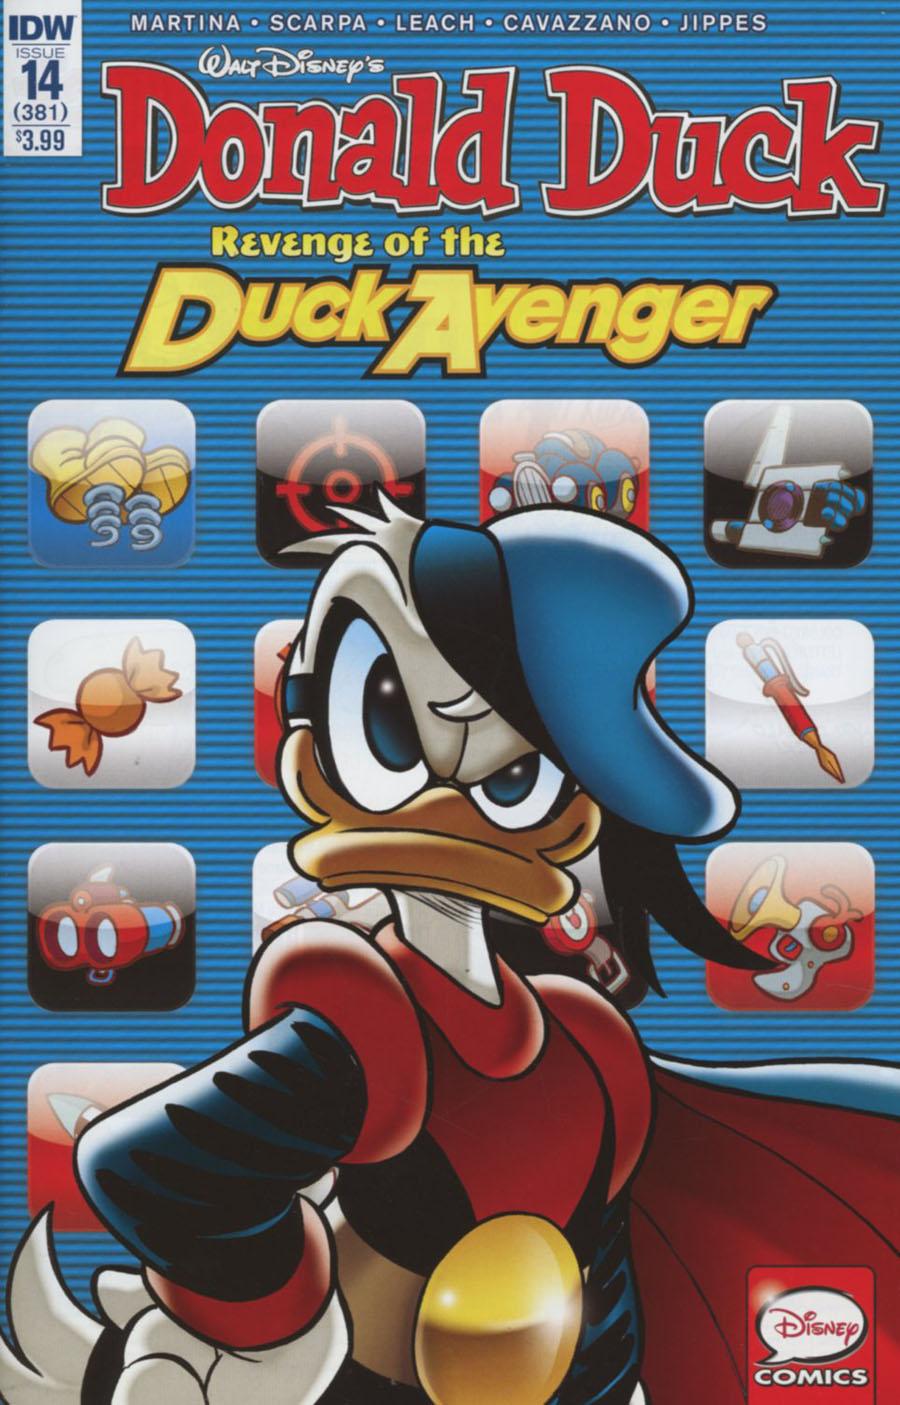 Donald Duck Vol 2 #14 Cover A Regular Andrea Freccero Cover